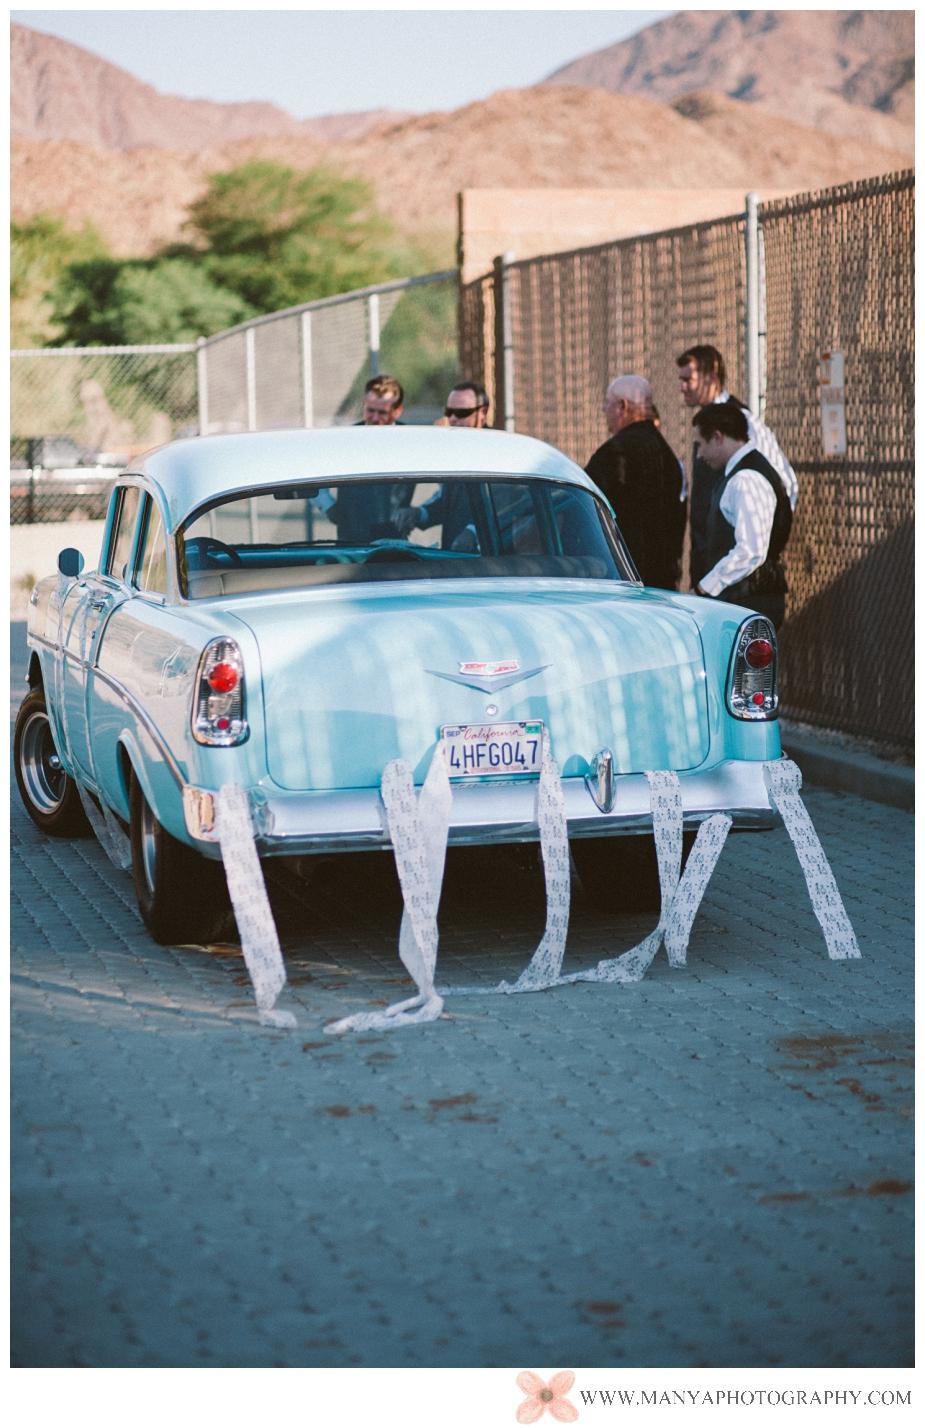 2013-07-28_0029 - Orange County Wedding Photographer